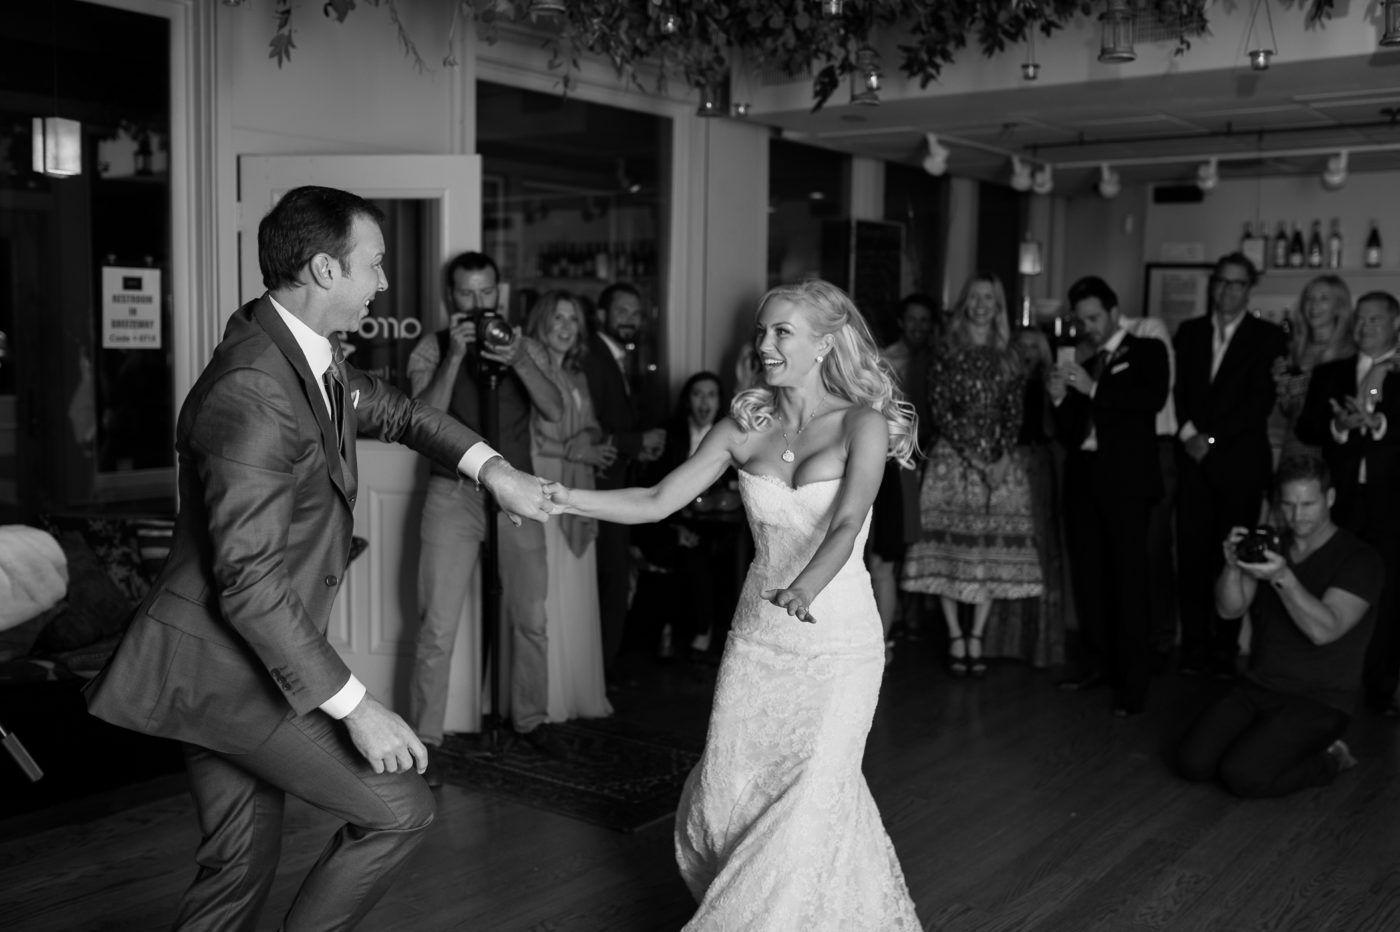 Brooke Werner Chad Knaus Chowen Photography Chad Knaus Wedding Engagement Photos Chad